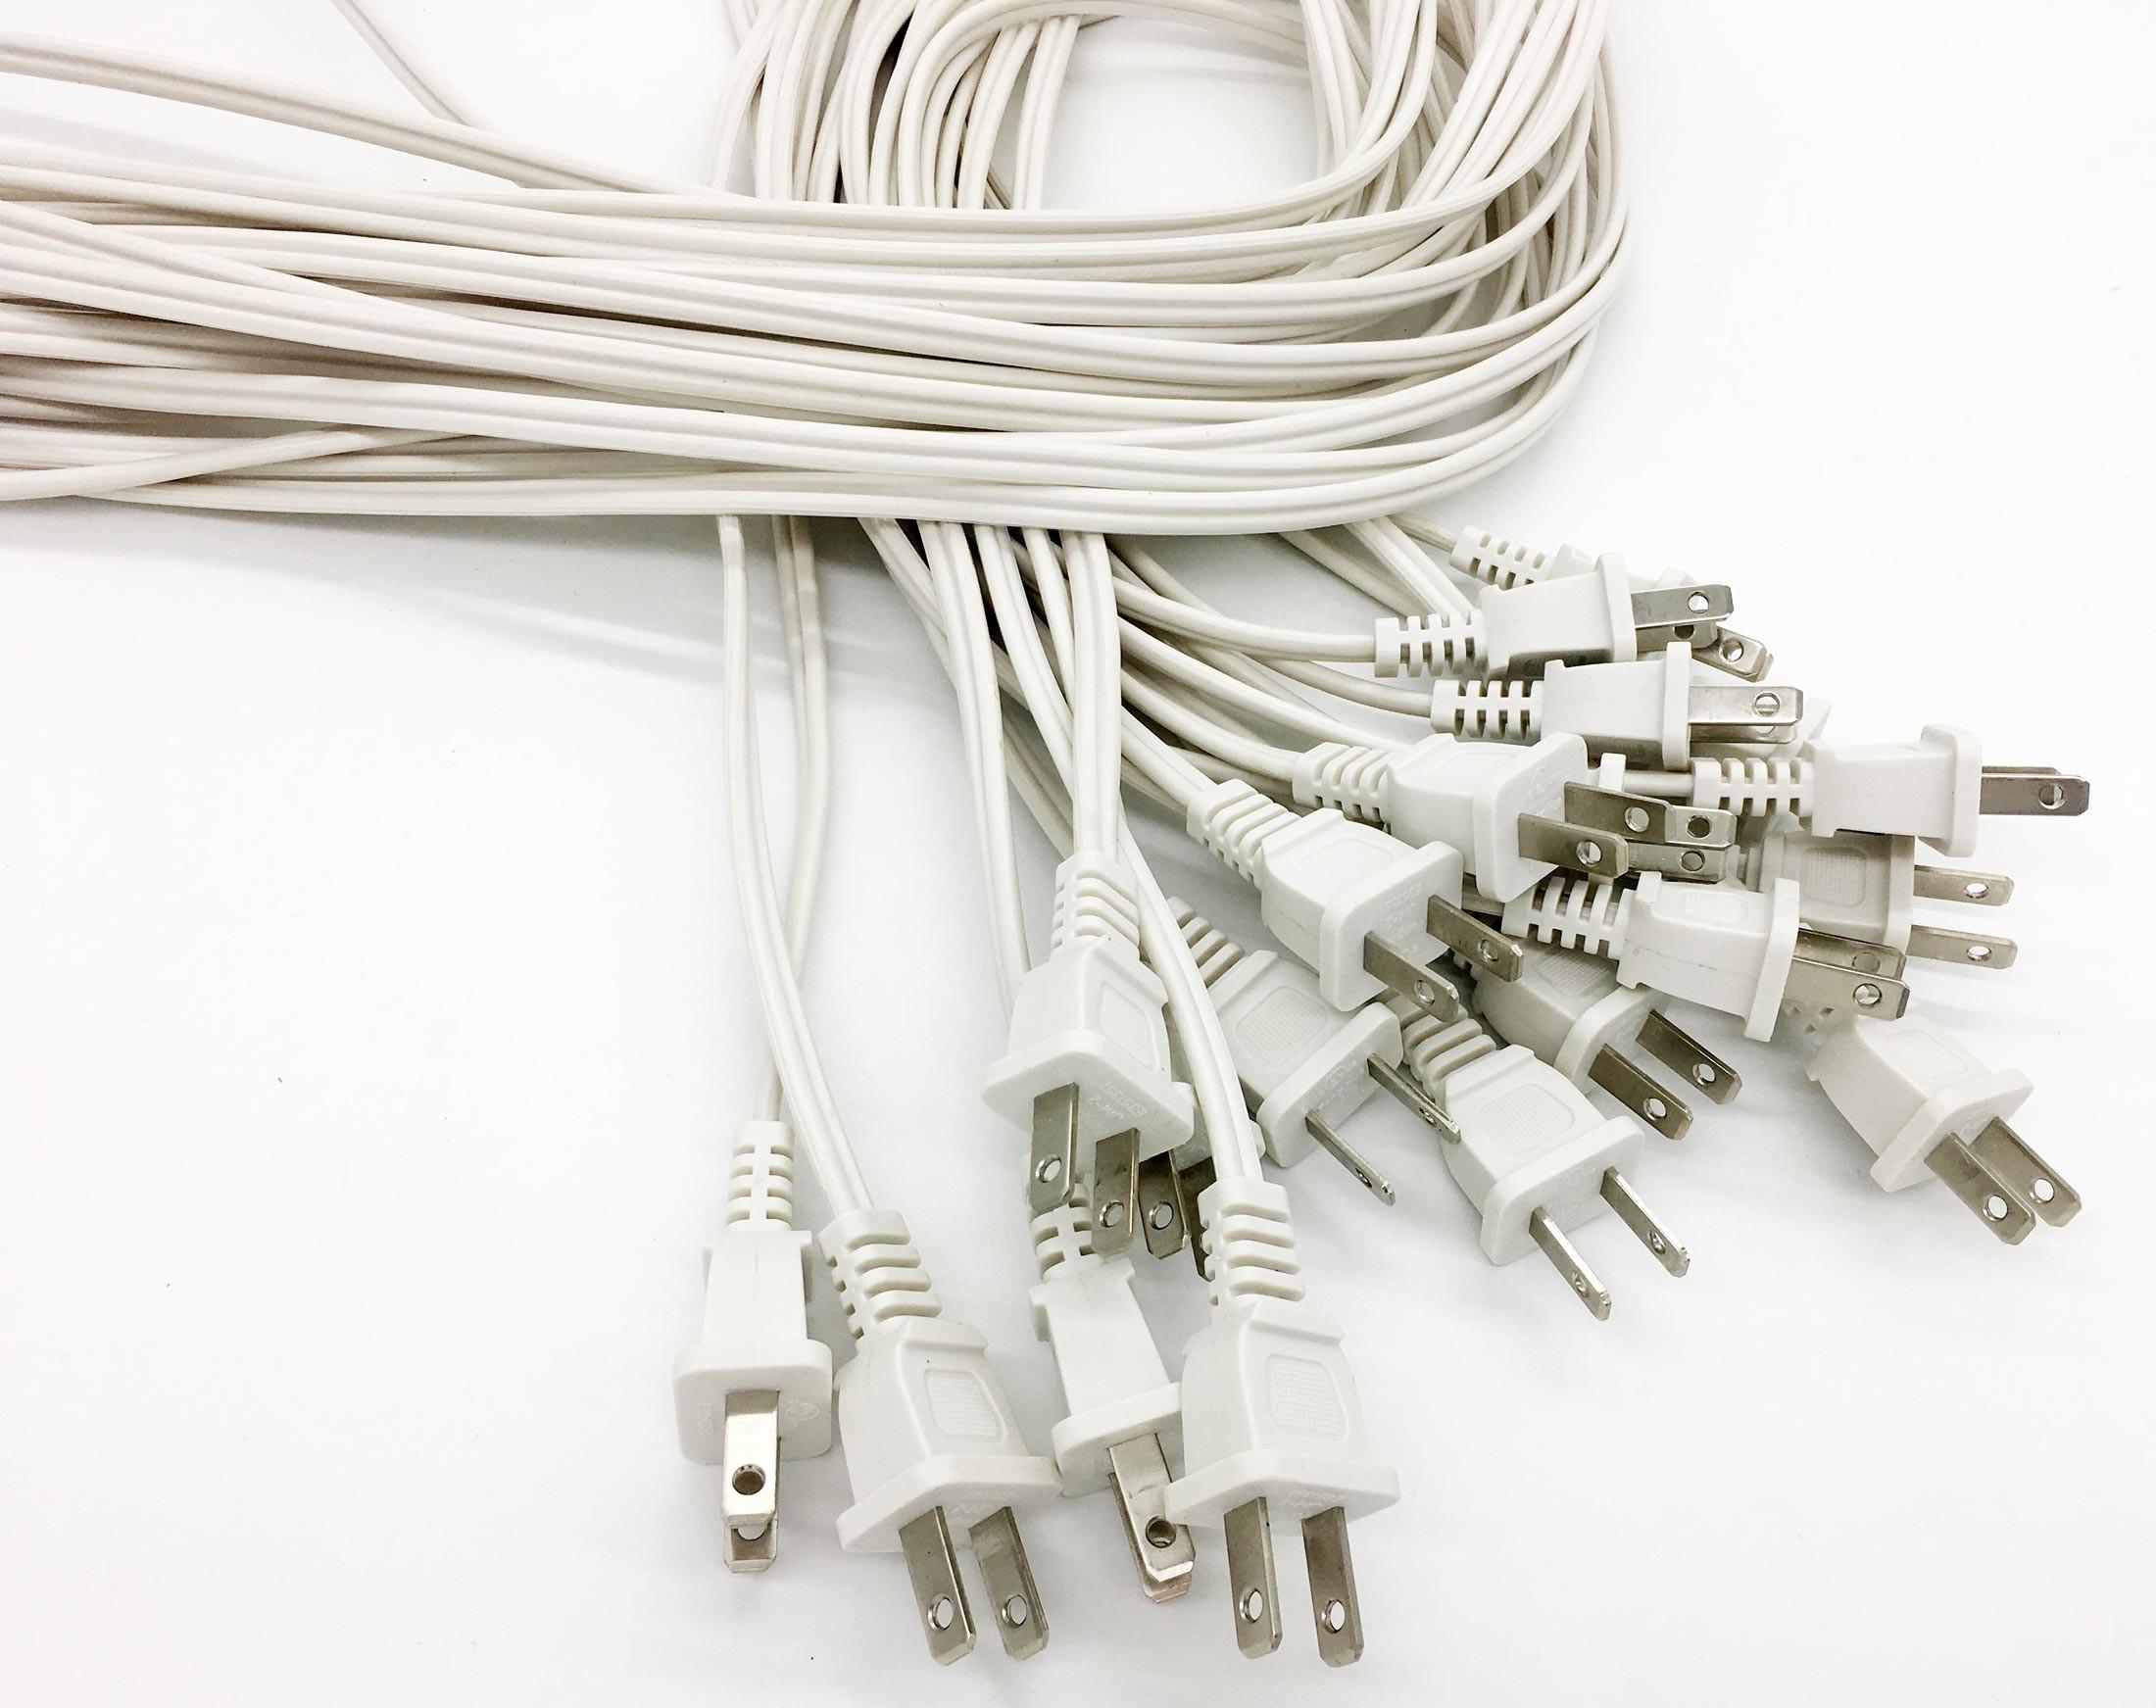 Stupendous Usa Power Cord Us Power Cord Nema 1 15P America Ul Canada Cul Wiring Digital Resources Remcakbiperorg